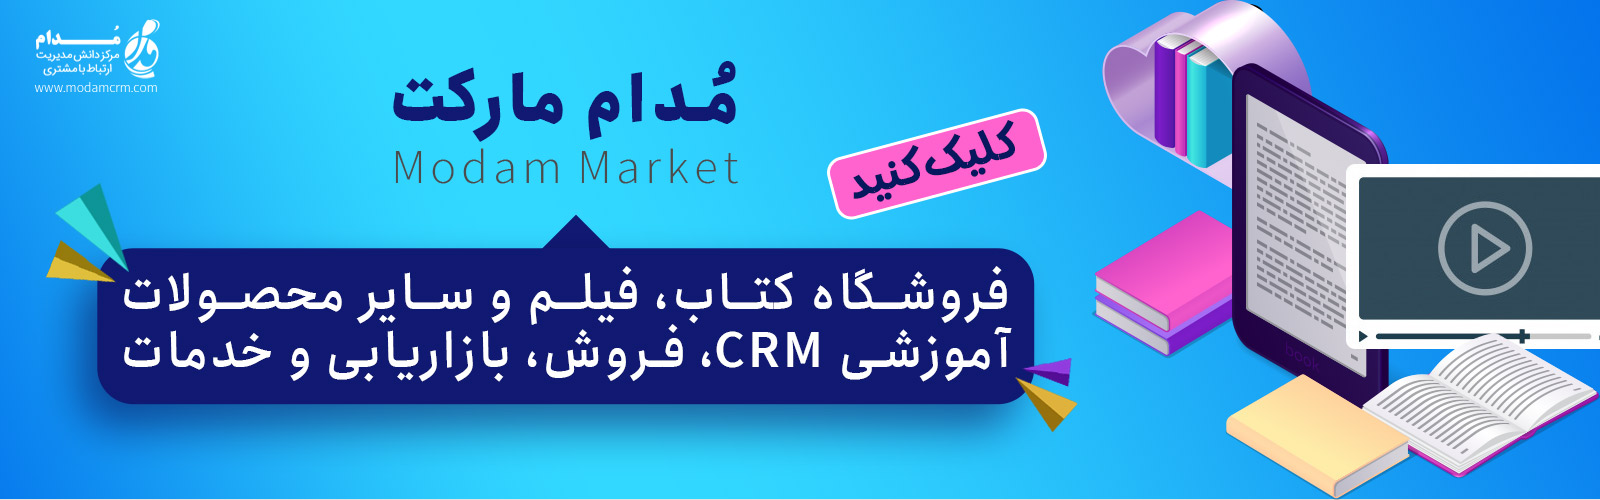 modam market